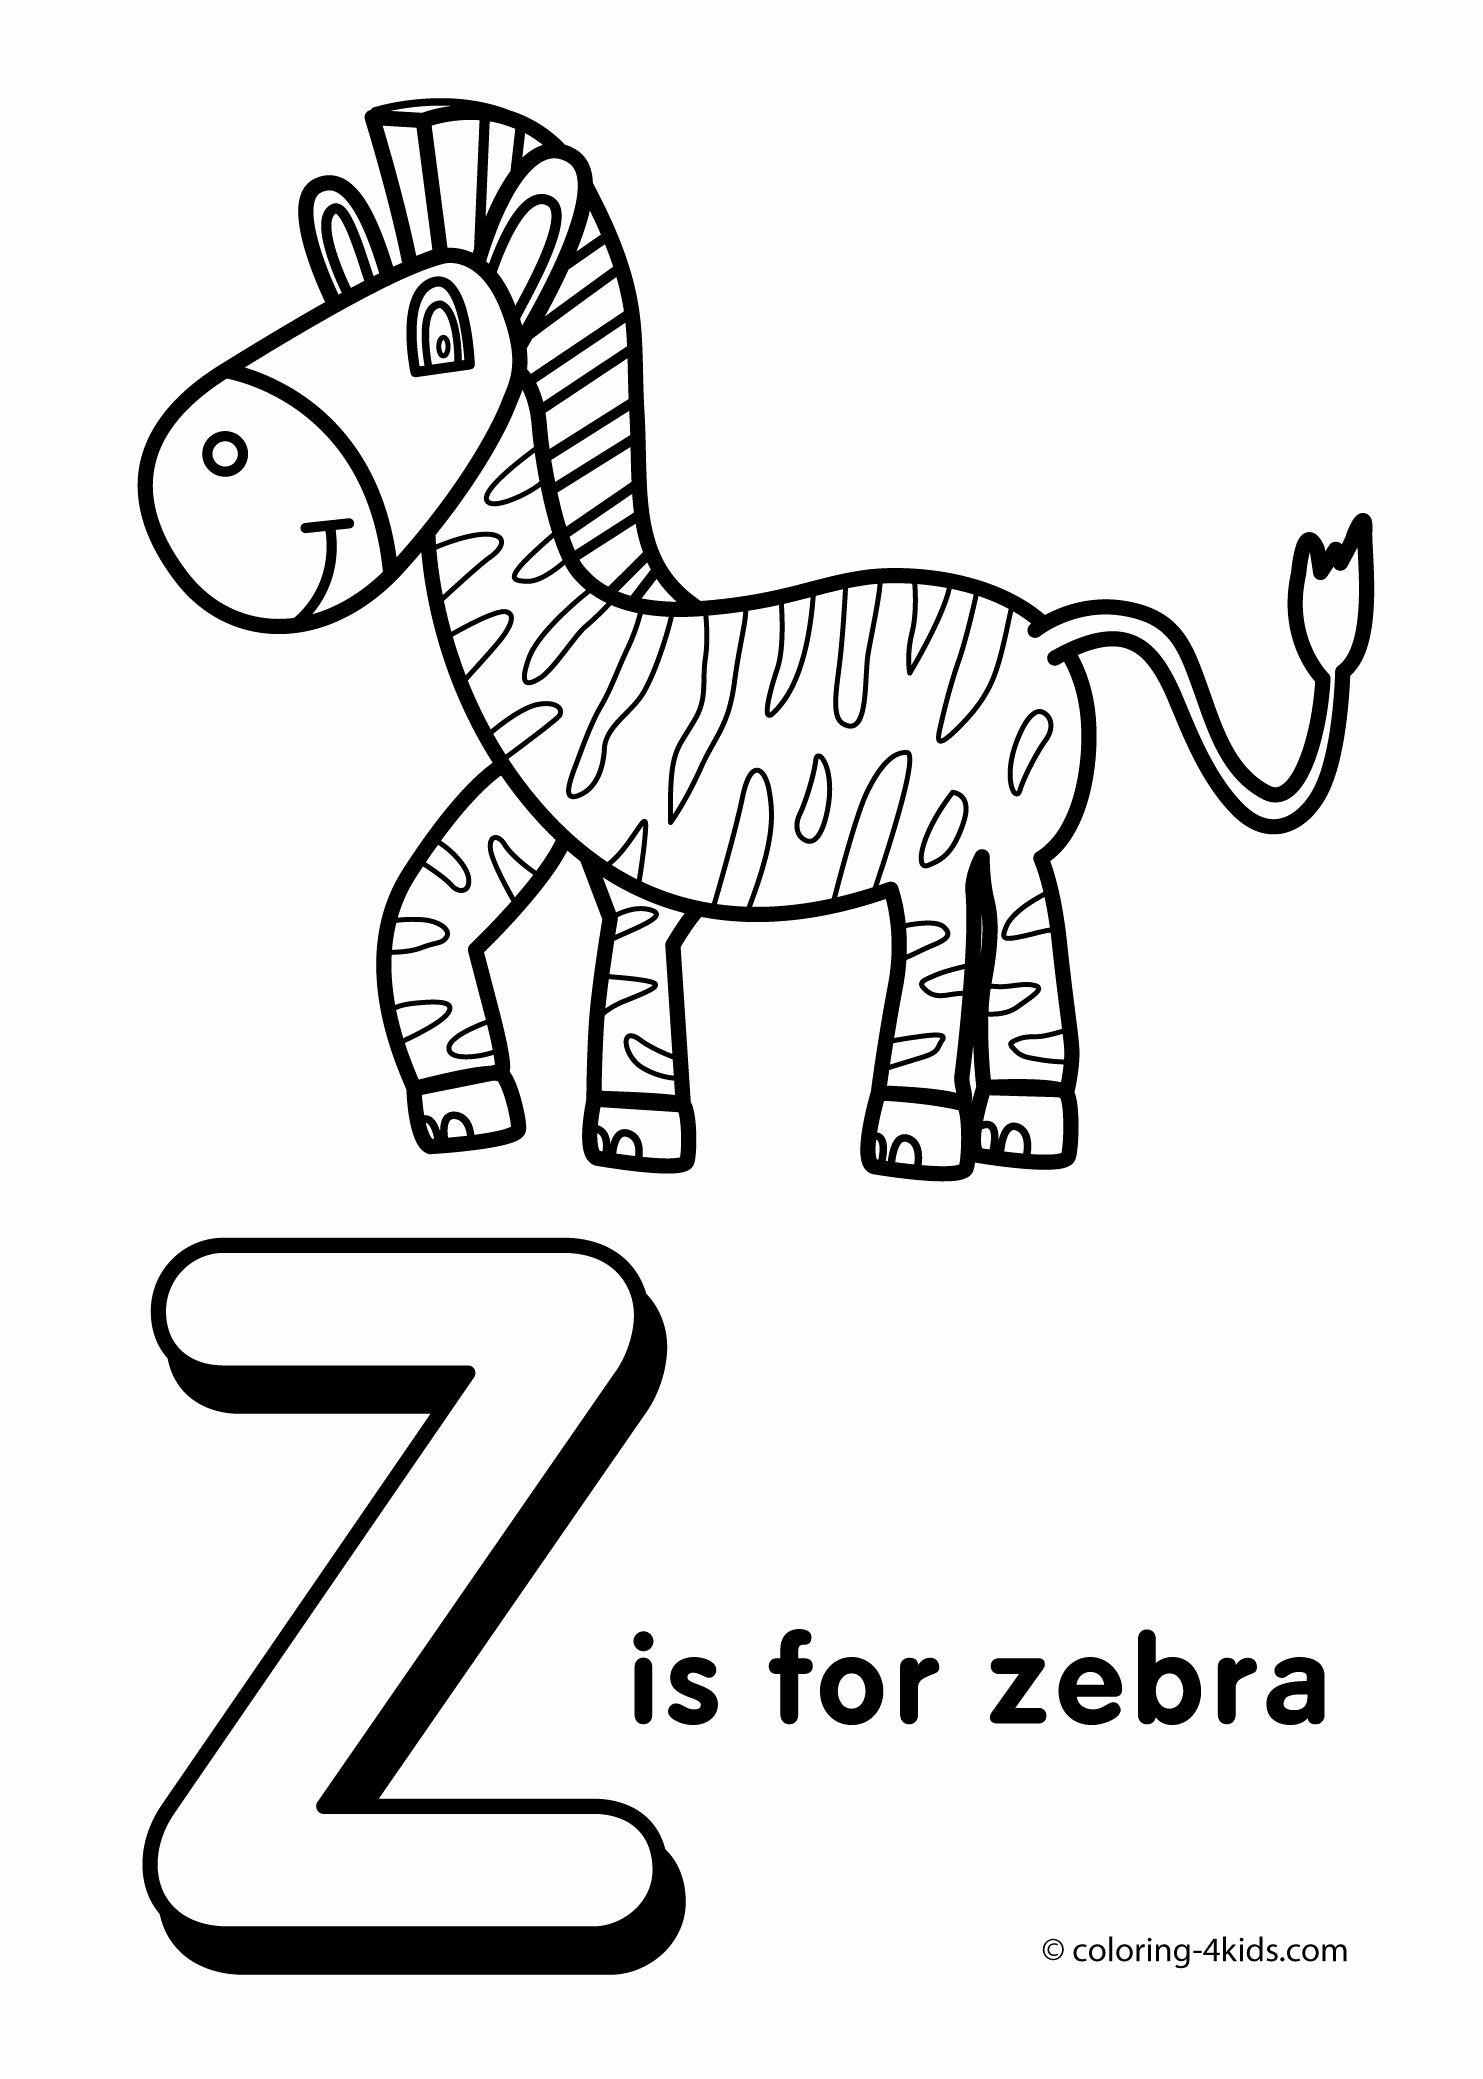 Alphabet Coloring Pages Preschool New Letter Z Coloring Pages Alphabet Coloring Pages Z Le Alphabet Coloring Alphabet Coloring Pages Printable Alphabet Letters